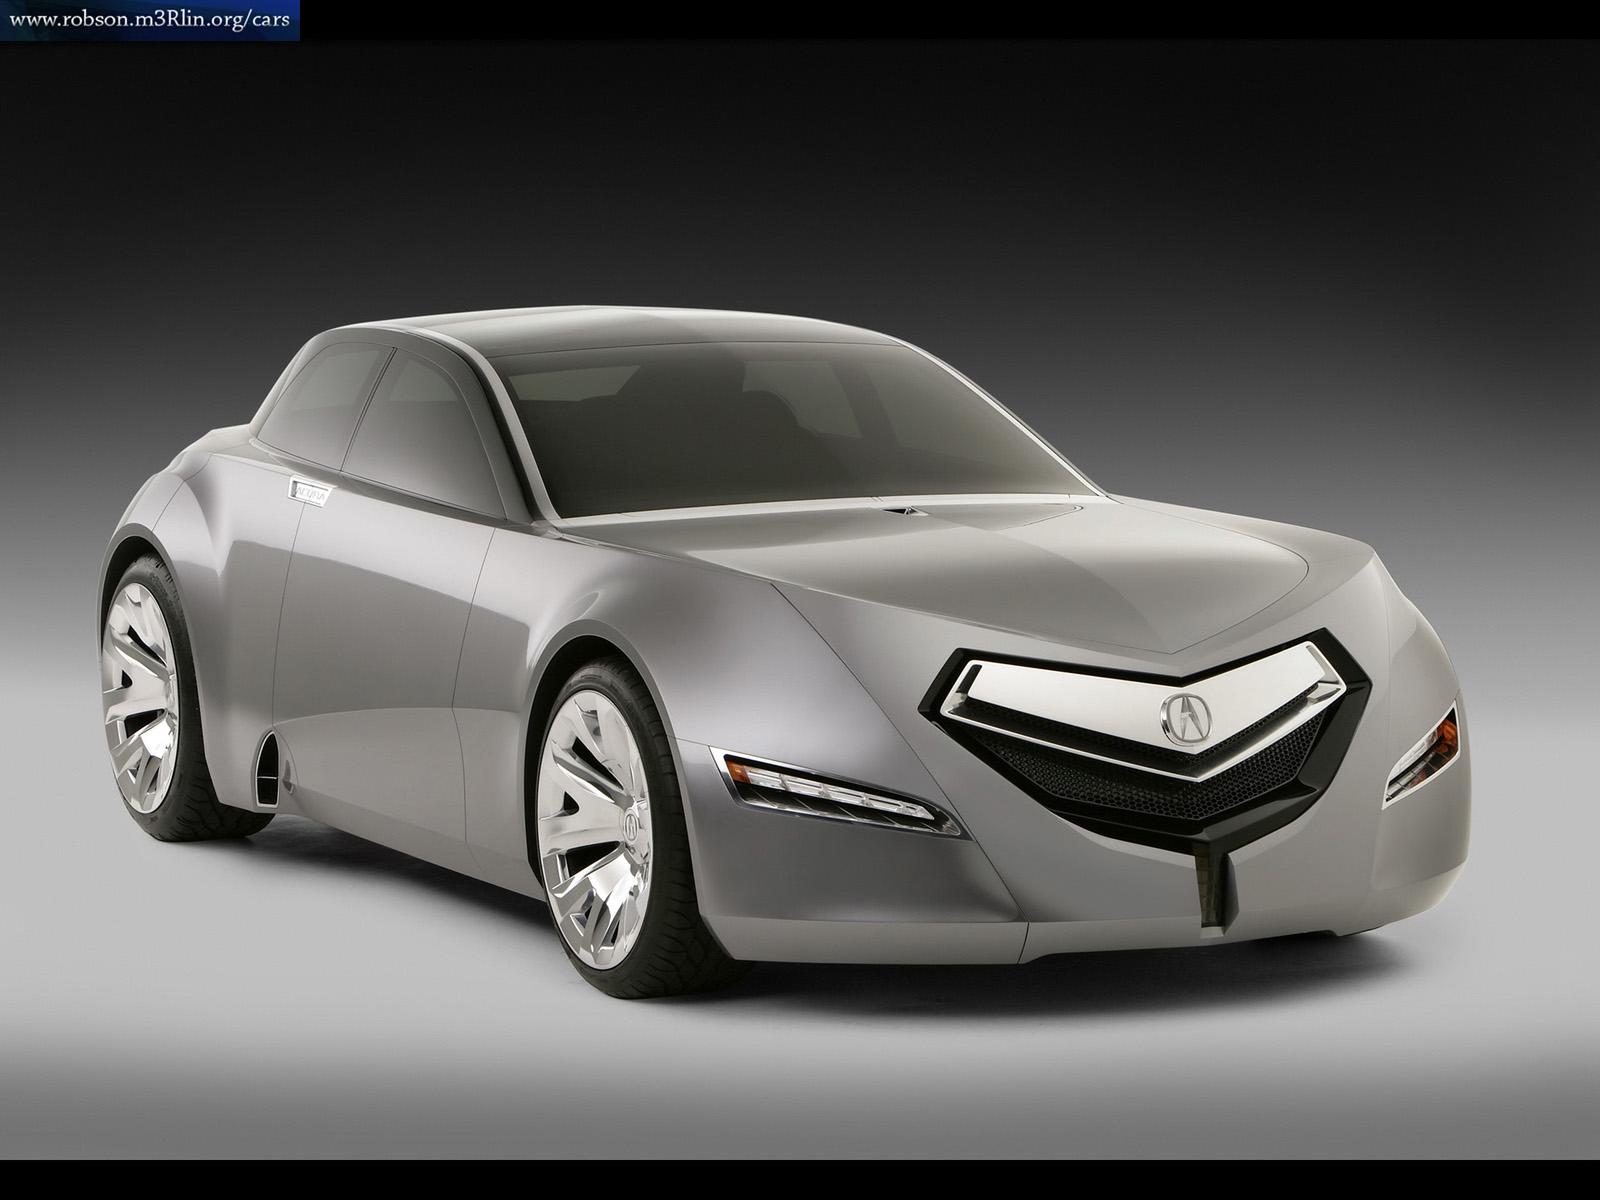 Acura-advanced-sedan-concept1-1-